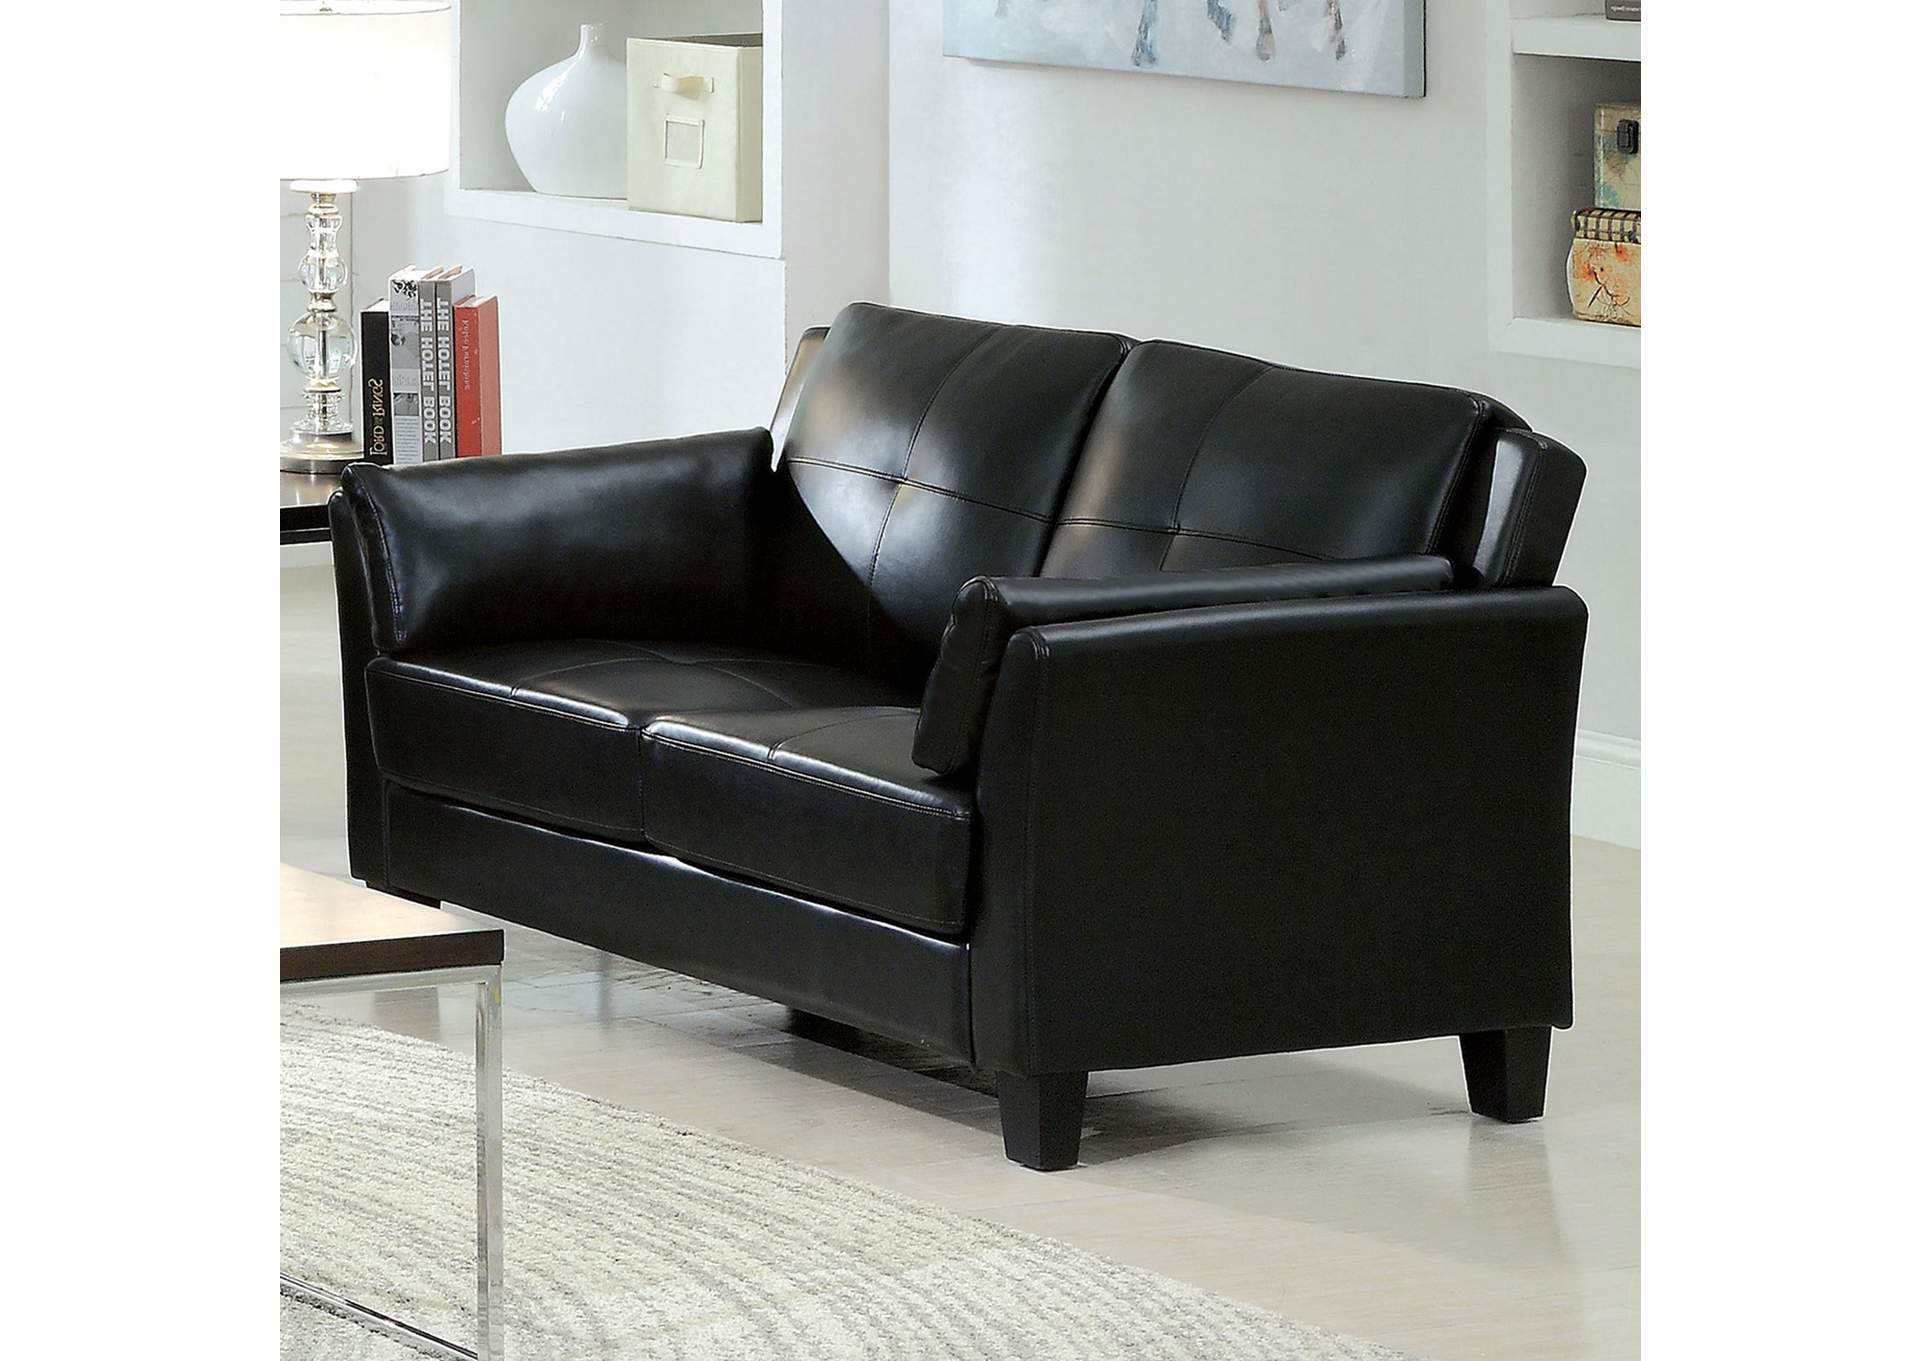 Remarkable Modern Furniture And Mattress Outlet Bellmawr Cherry Forskolin Free Trial Chair Design Images Forskolin Free Trialorg